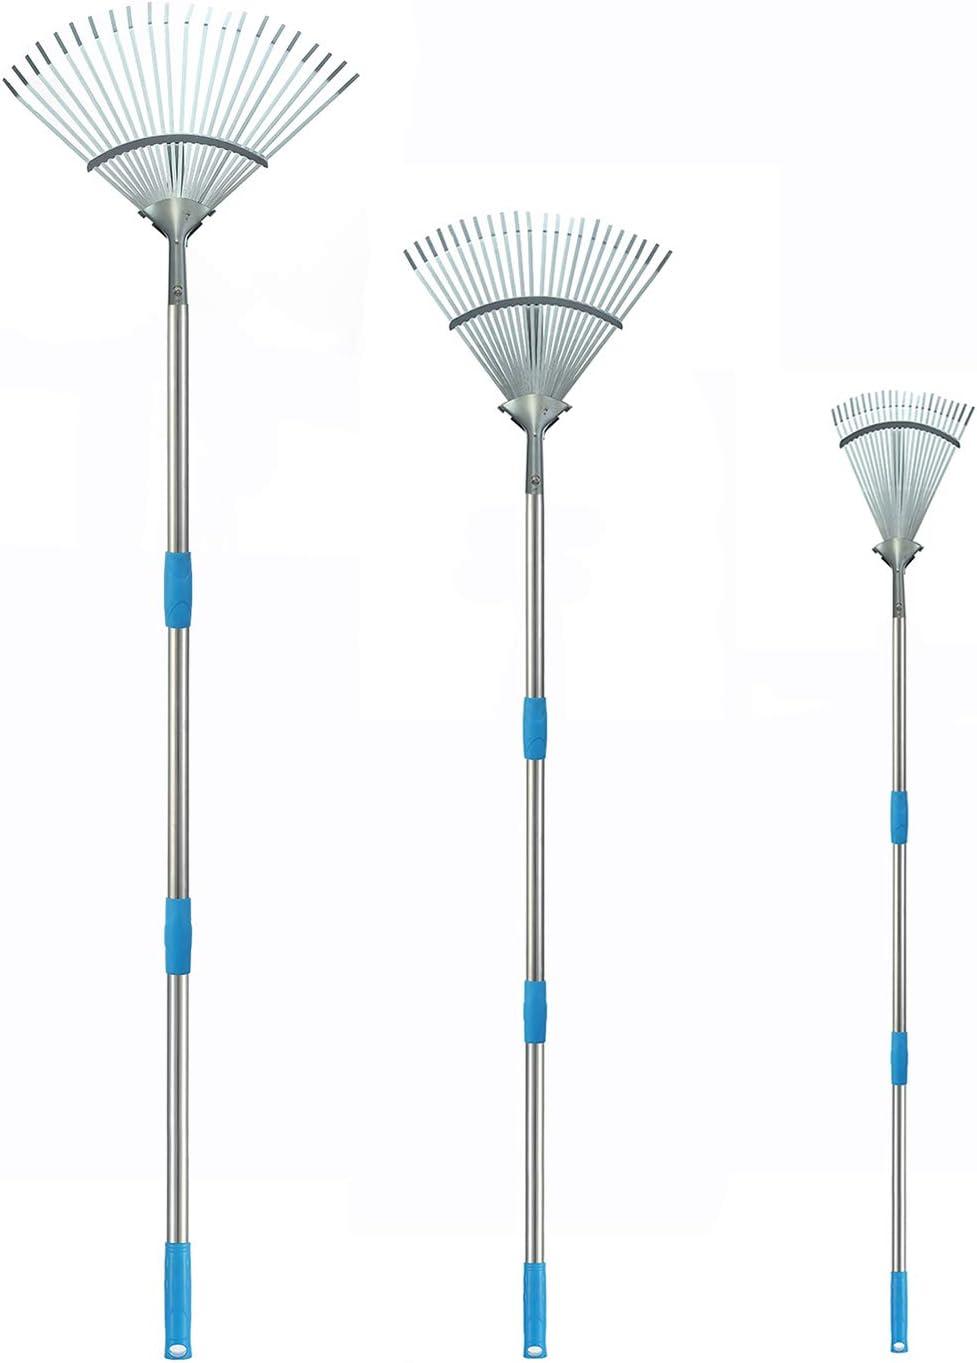 INFLATION 4FT Adjustable Garden Leaf Rake - Expanding Metal Rake with Telescoping Pole - Adjustable Folding Head from 10